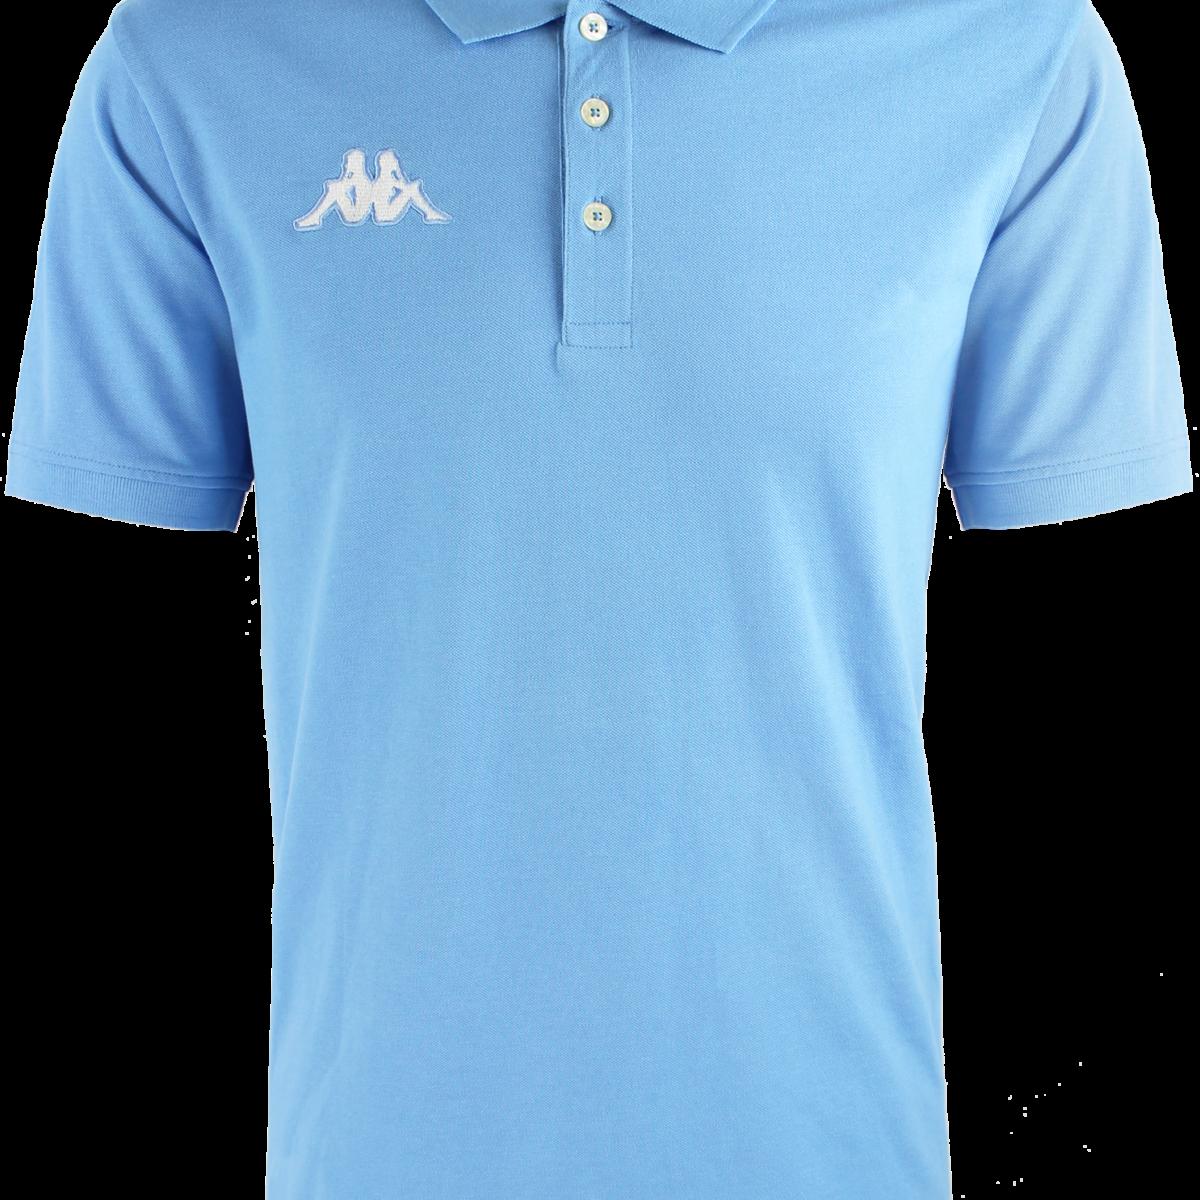 Peglio Polo Shirt 304TSDO 930 - ADULT FC Fresno Academy